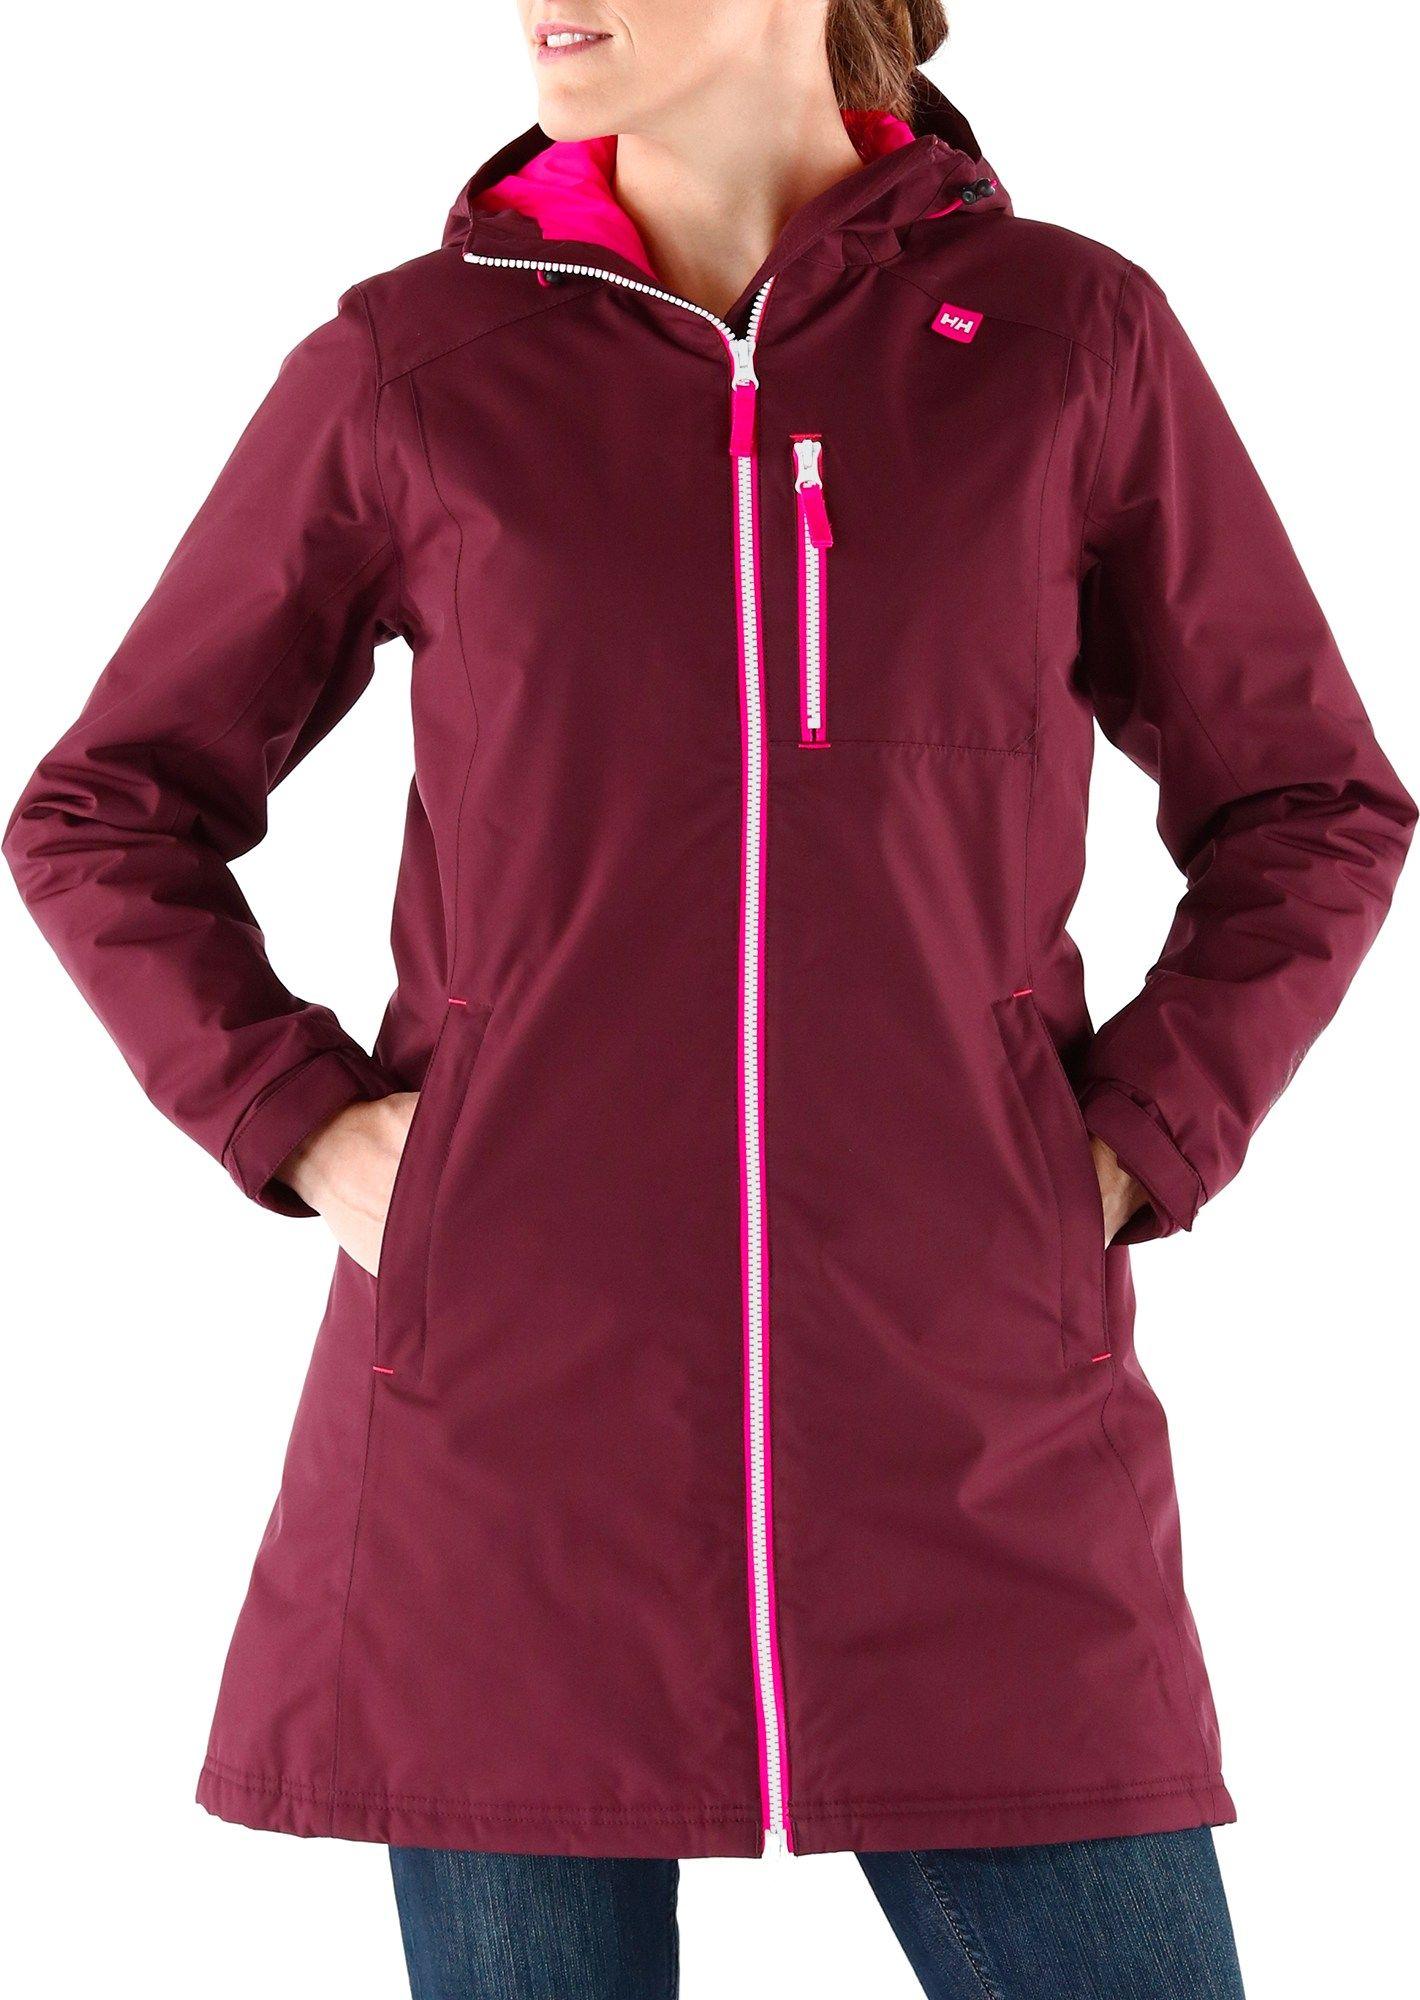 Helly Hansen Long Belfast Insulated Jacket Women S Rei Co Op Insulated Jackets Jackets Insulated Jacket Women